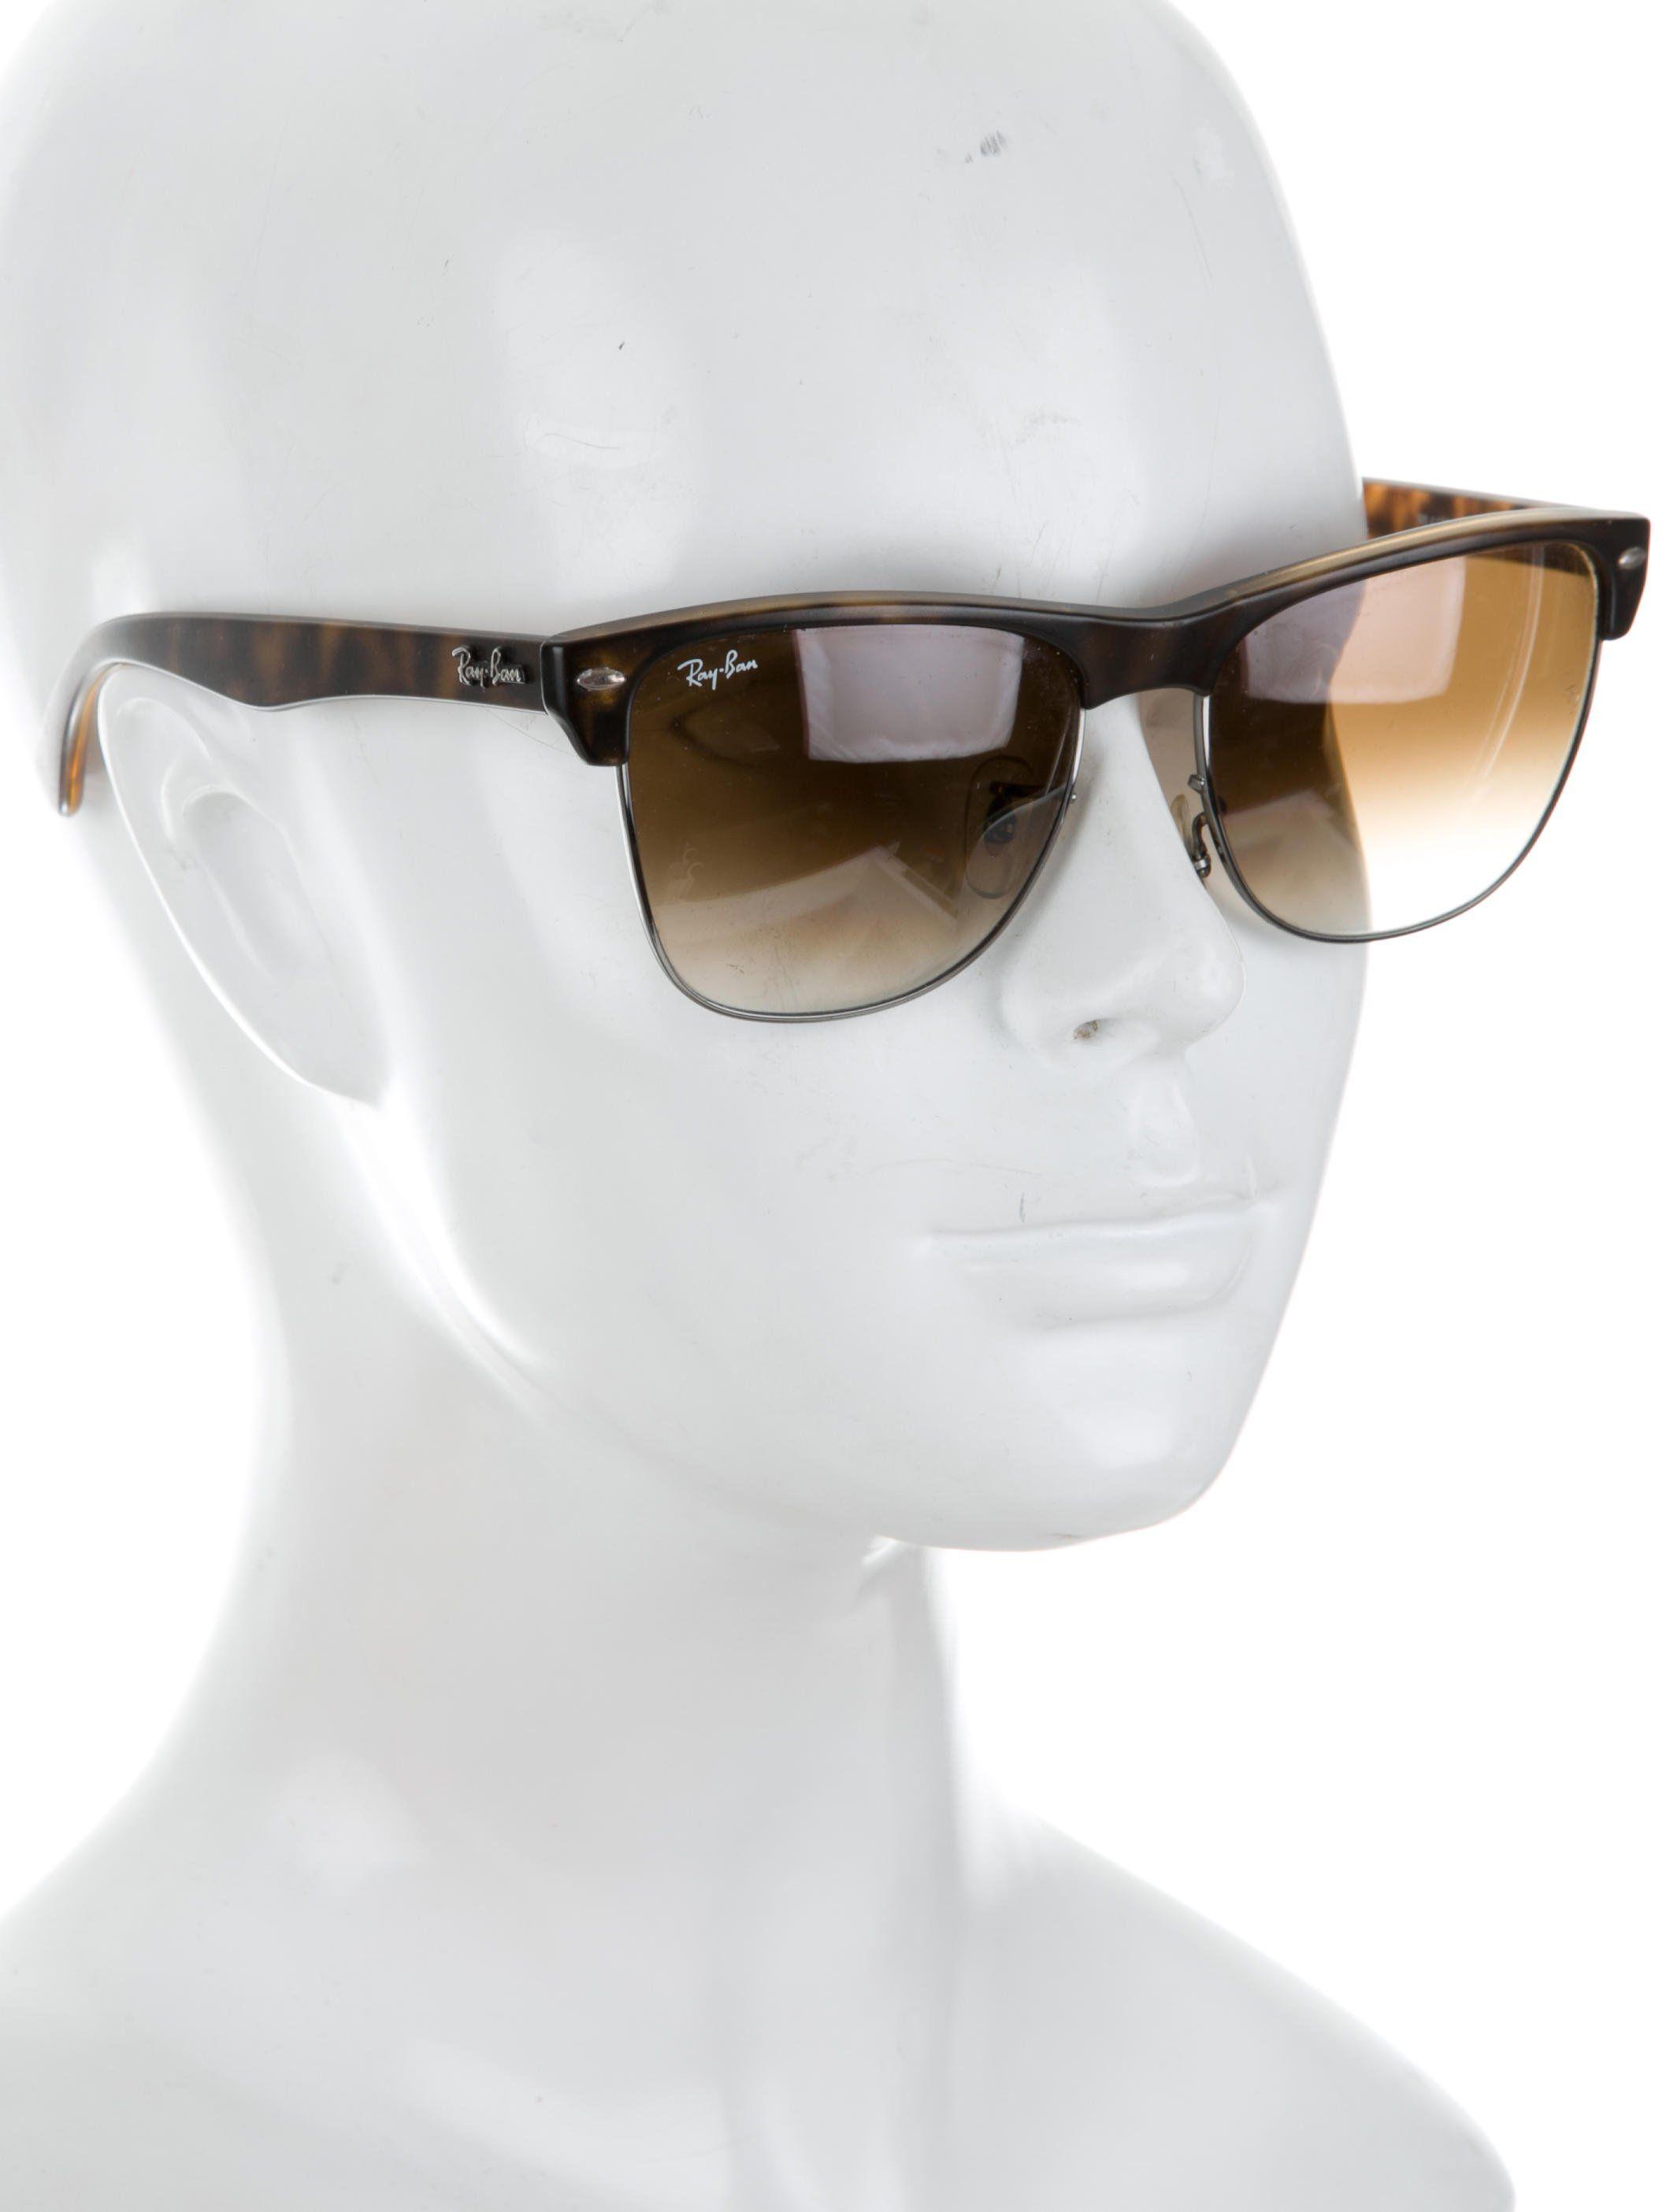 b4c3355b14 Men s tortoiseshell acetate Ray-Ban polarized wayfarer sunglasses with  square gradient lenses